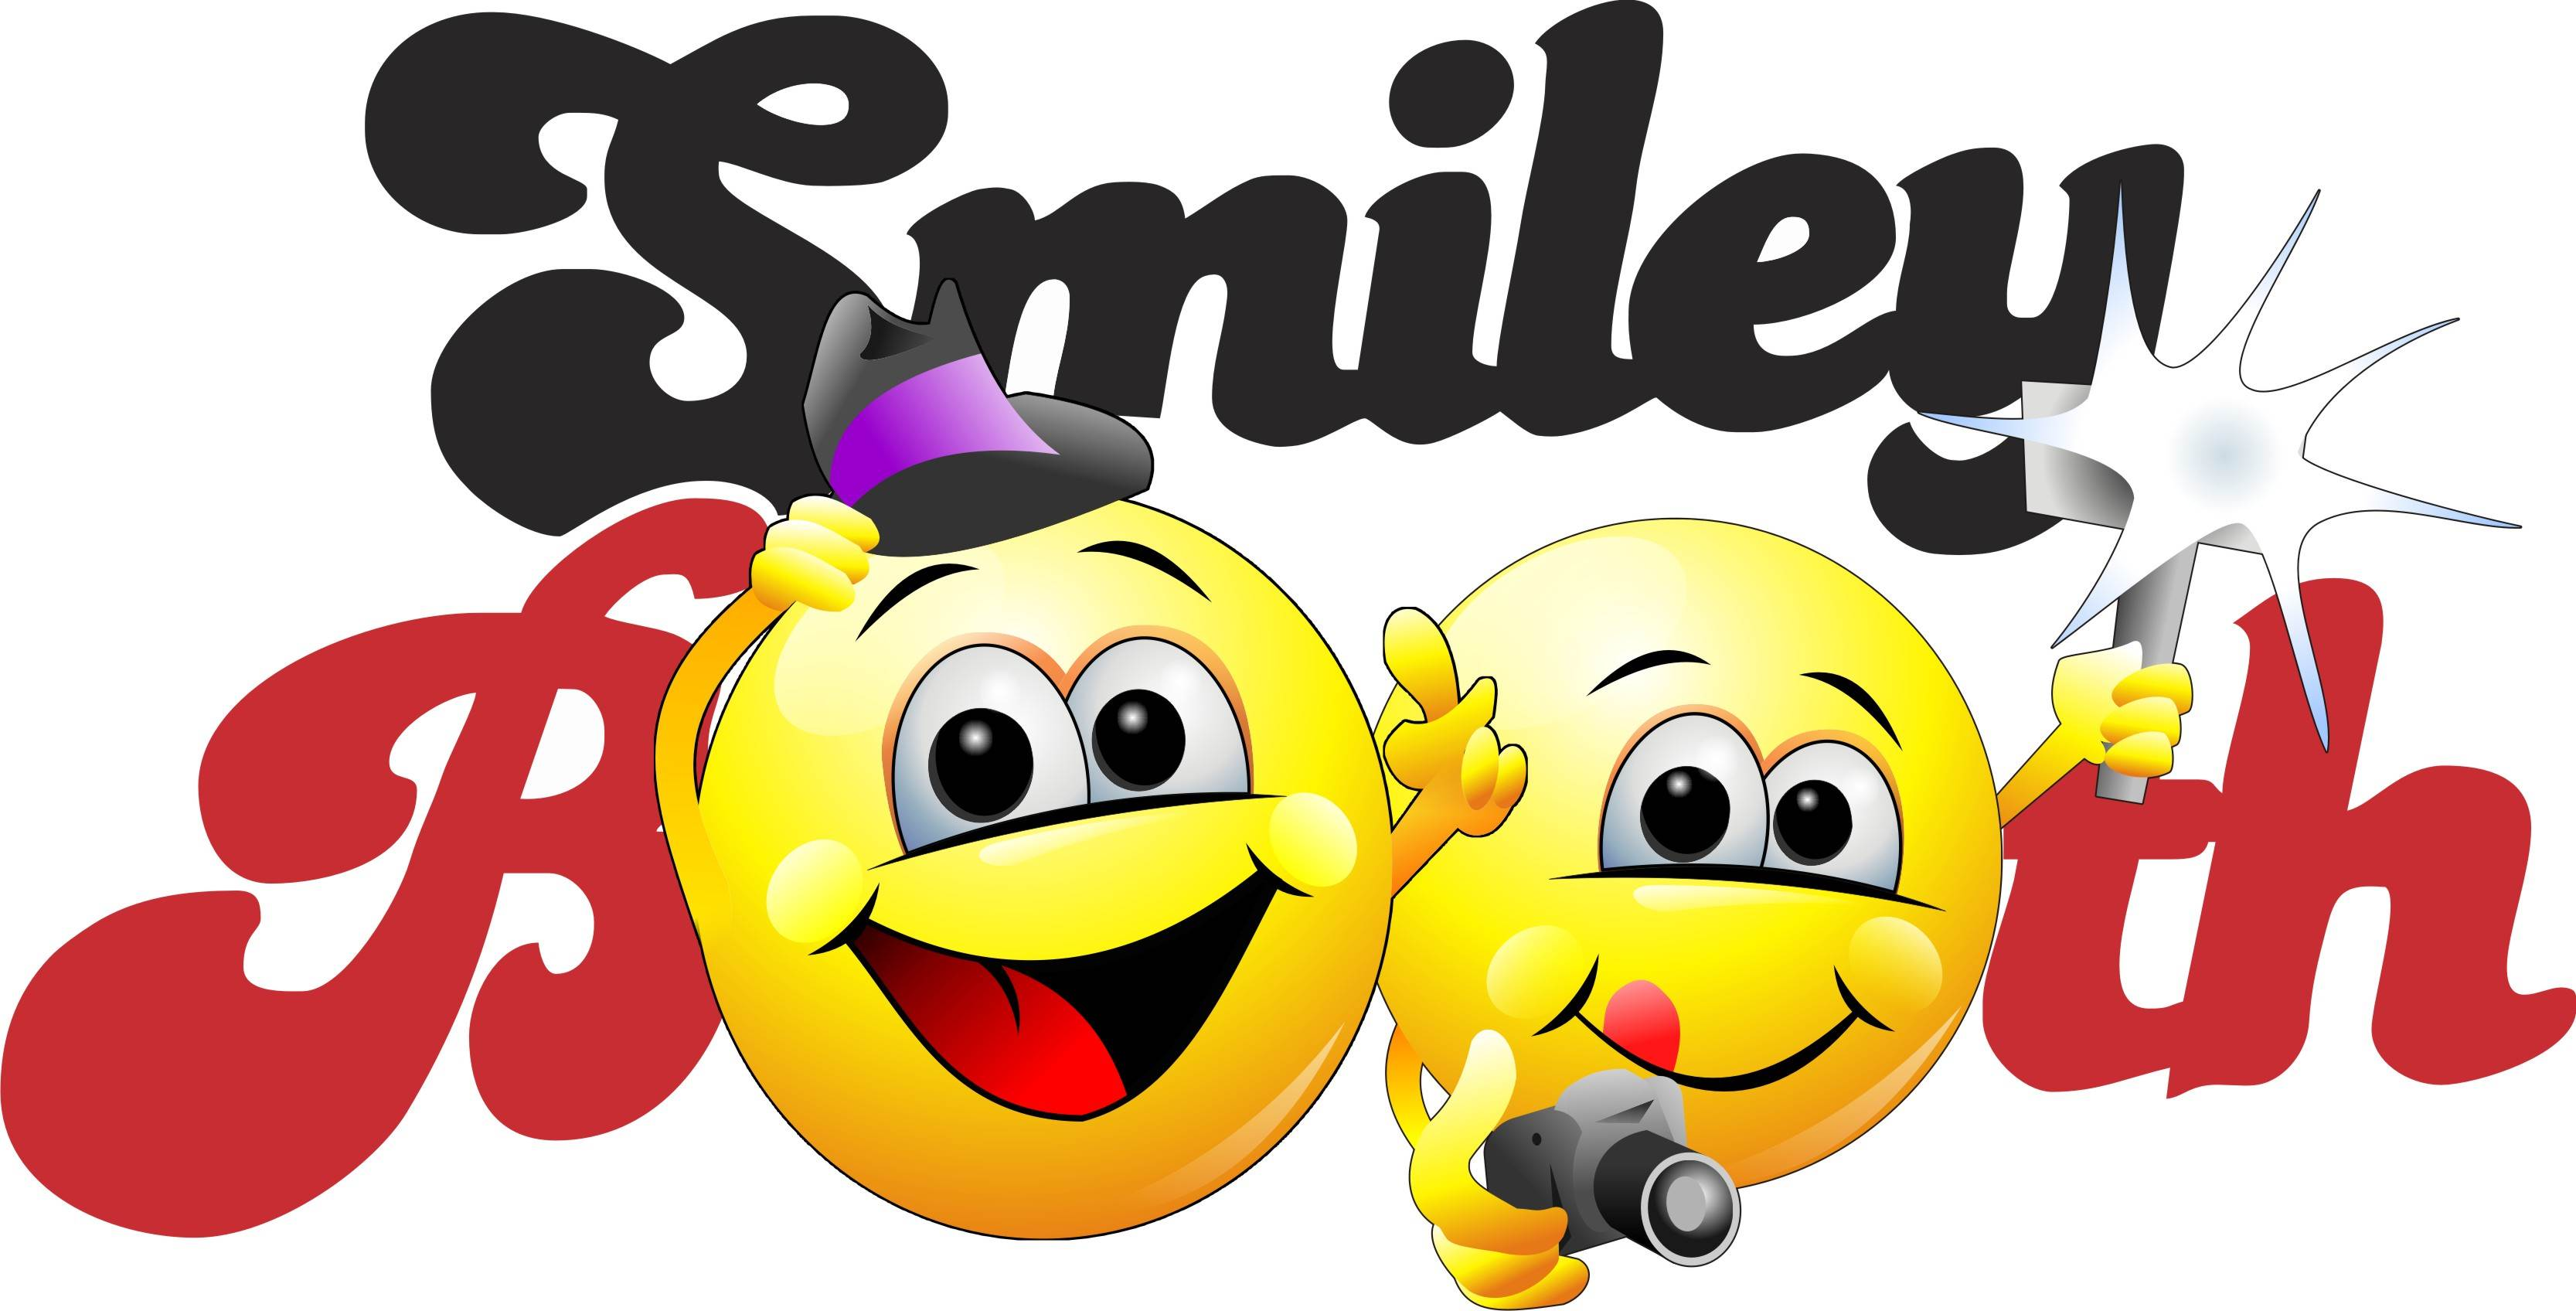 Smiley Booth logo